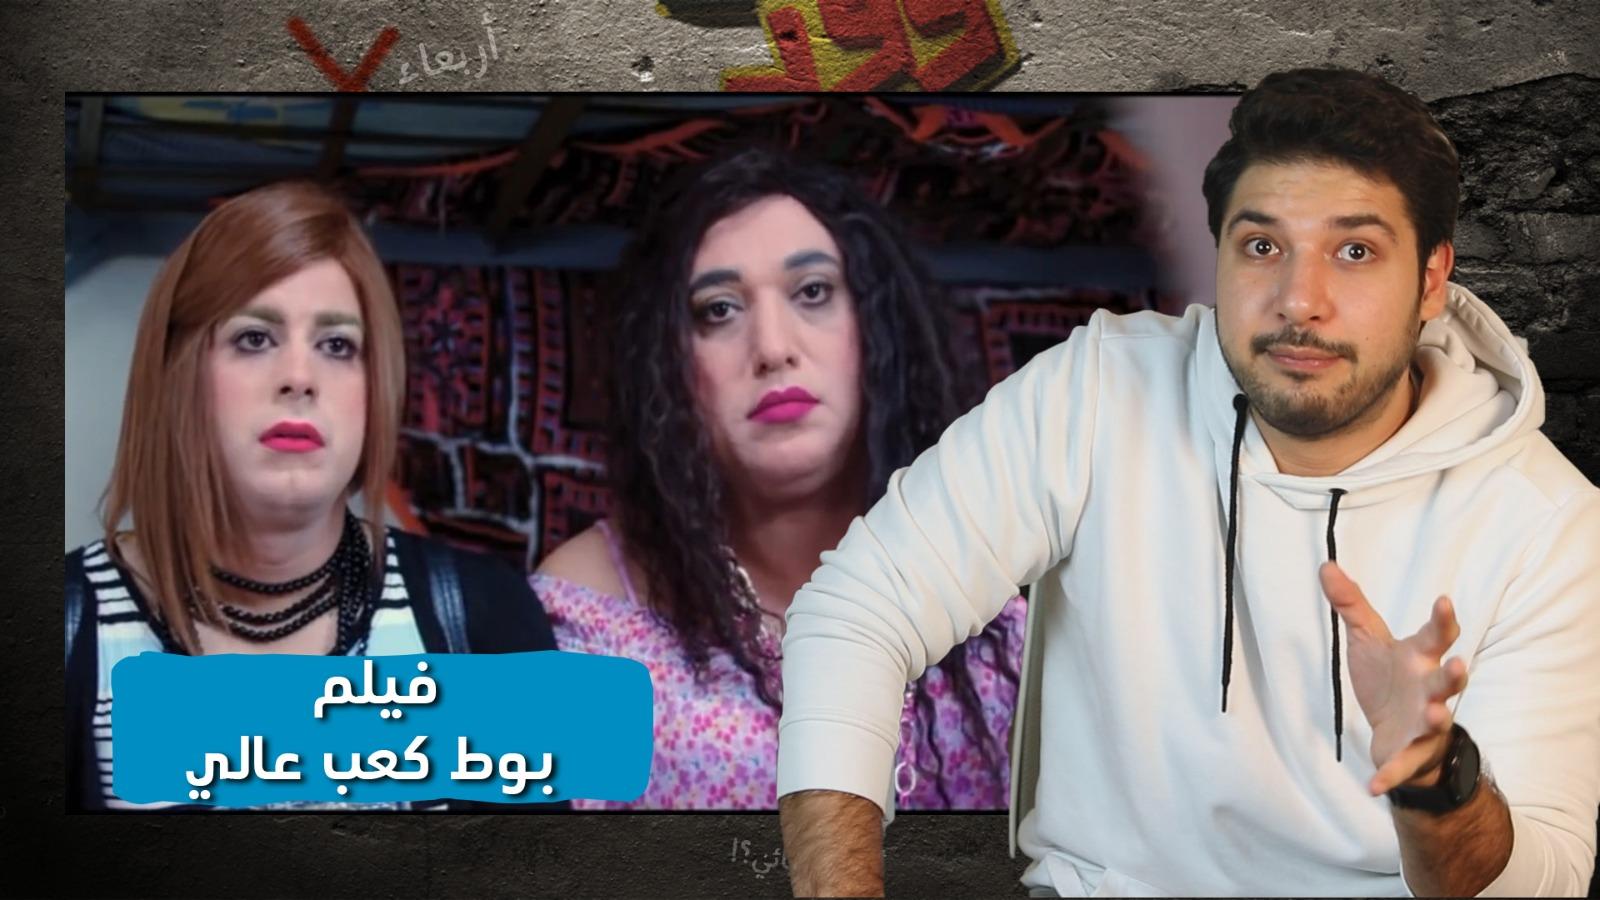 بوط كعب عالي فيلم سوري كامل